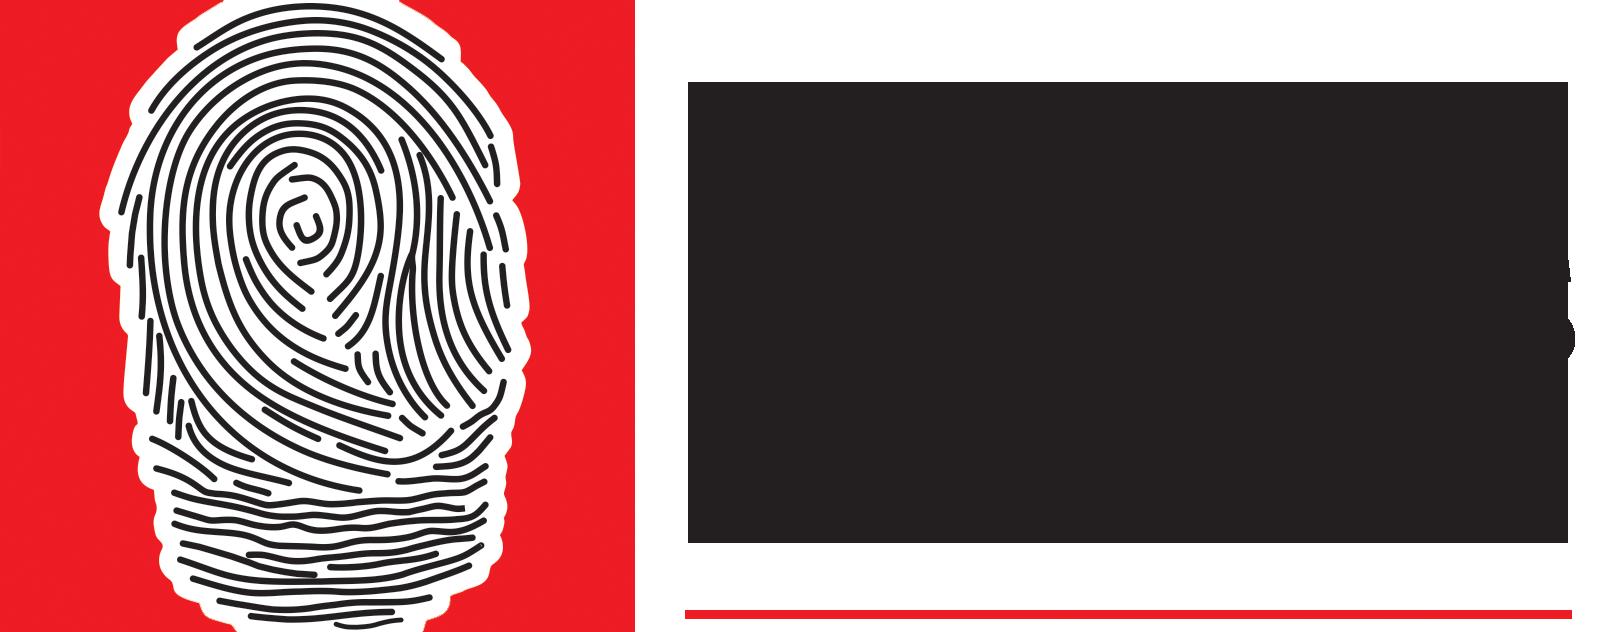 www.future.am